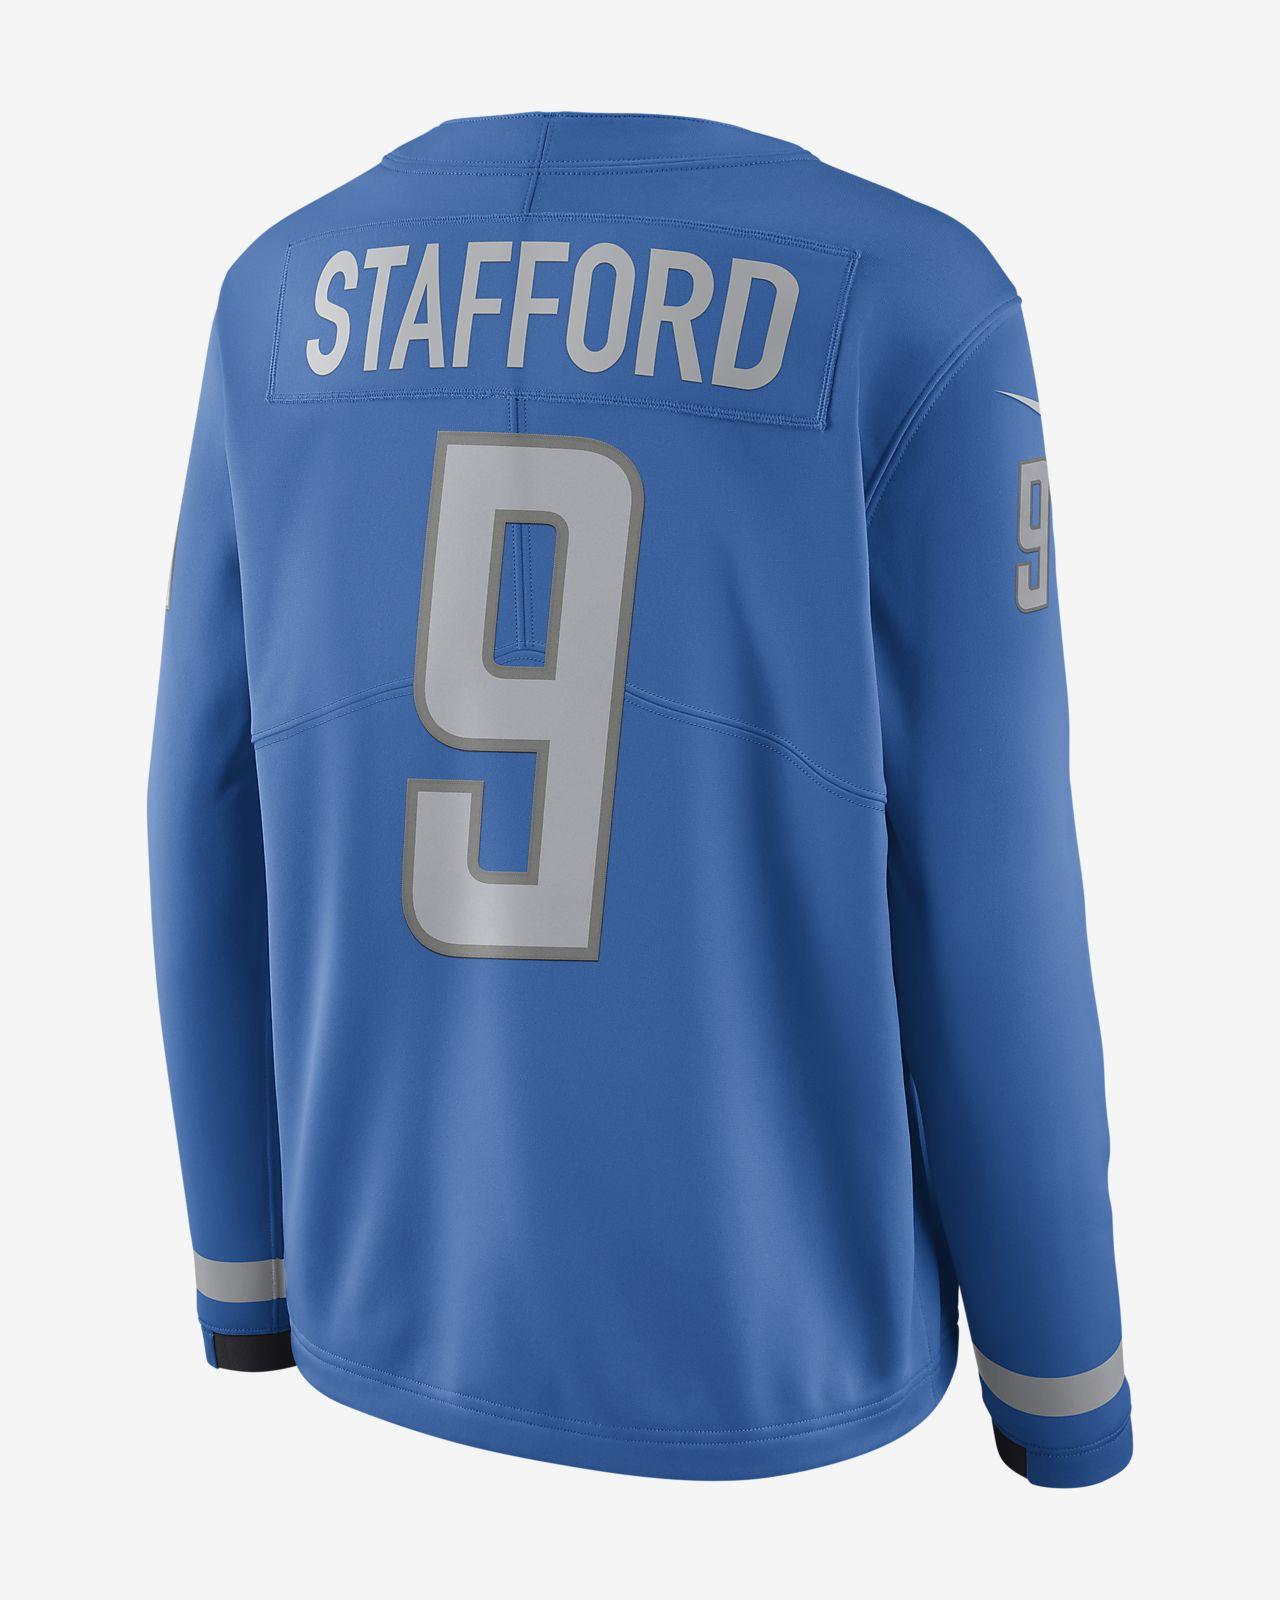 Top NFL Detroit Lions Jersey (Matthew Stafford) Women's Long Sleeve  hot sale